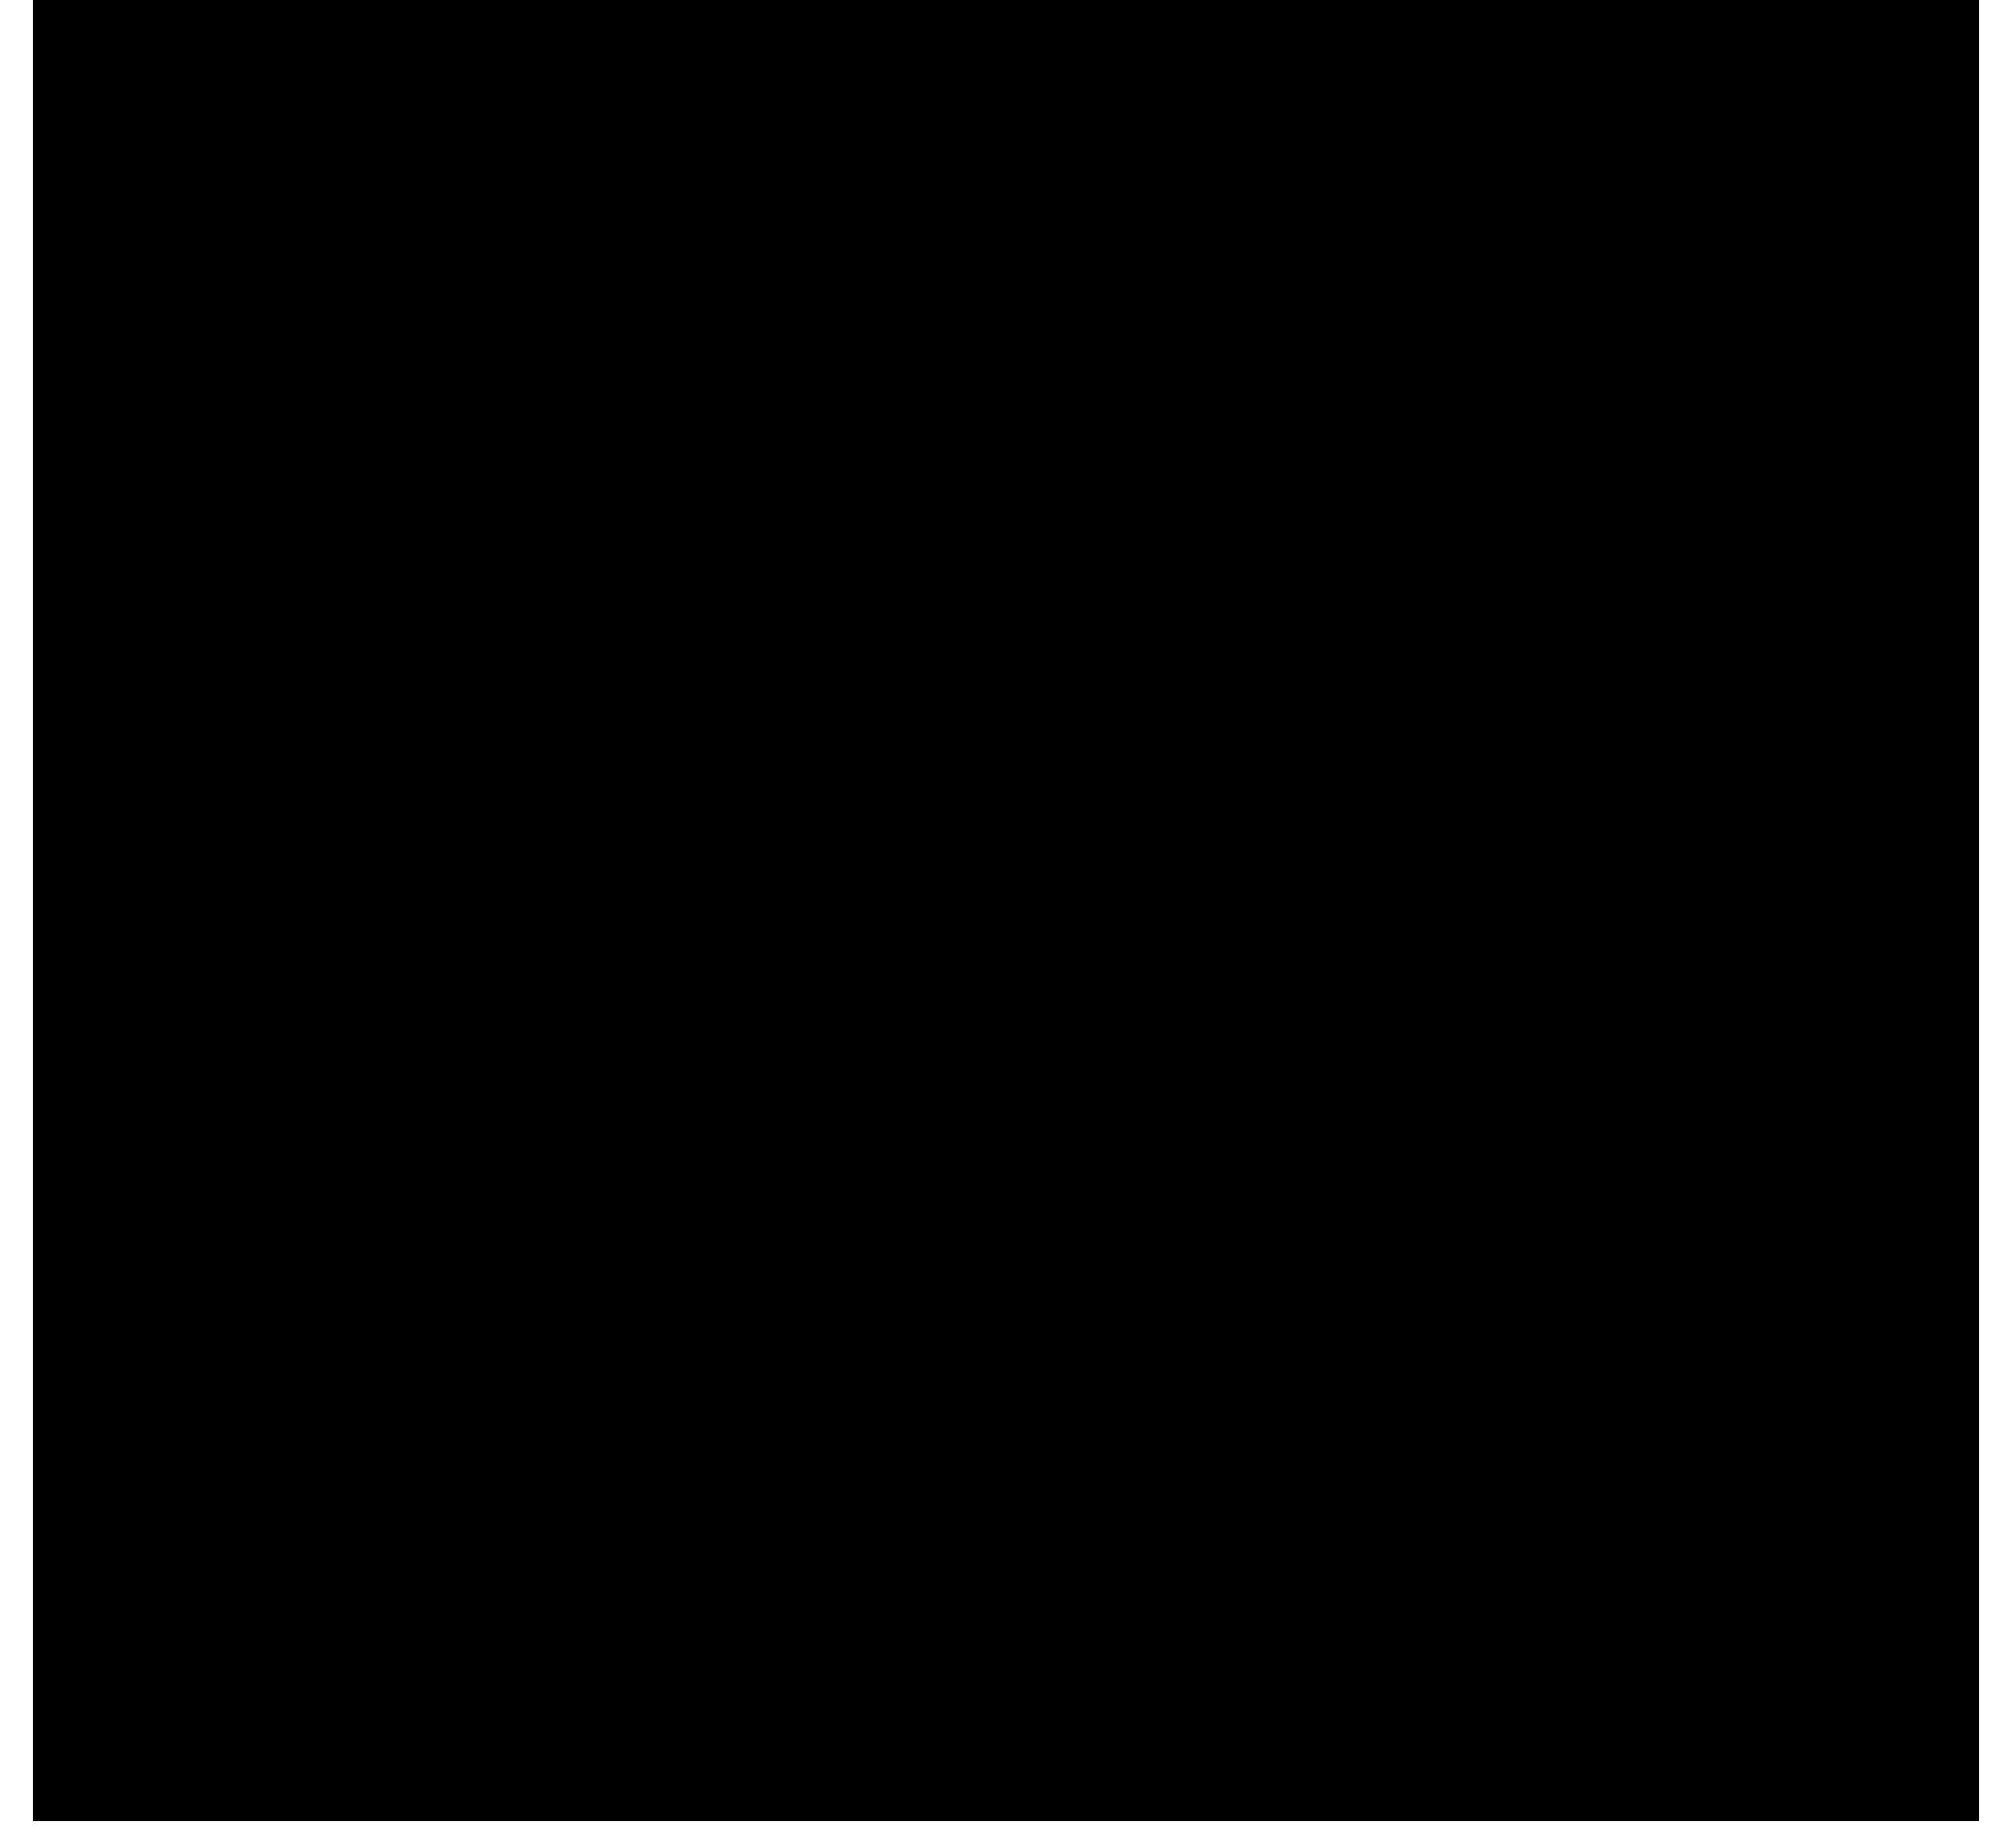 PLUSPOL